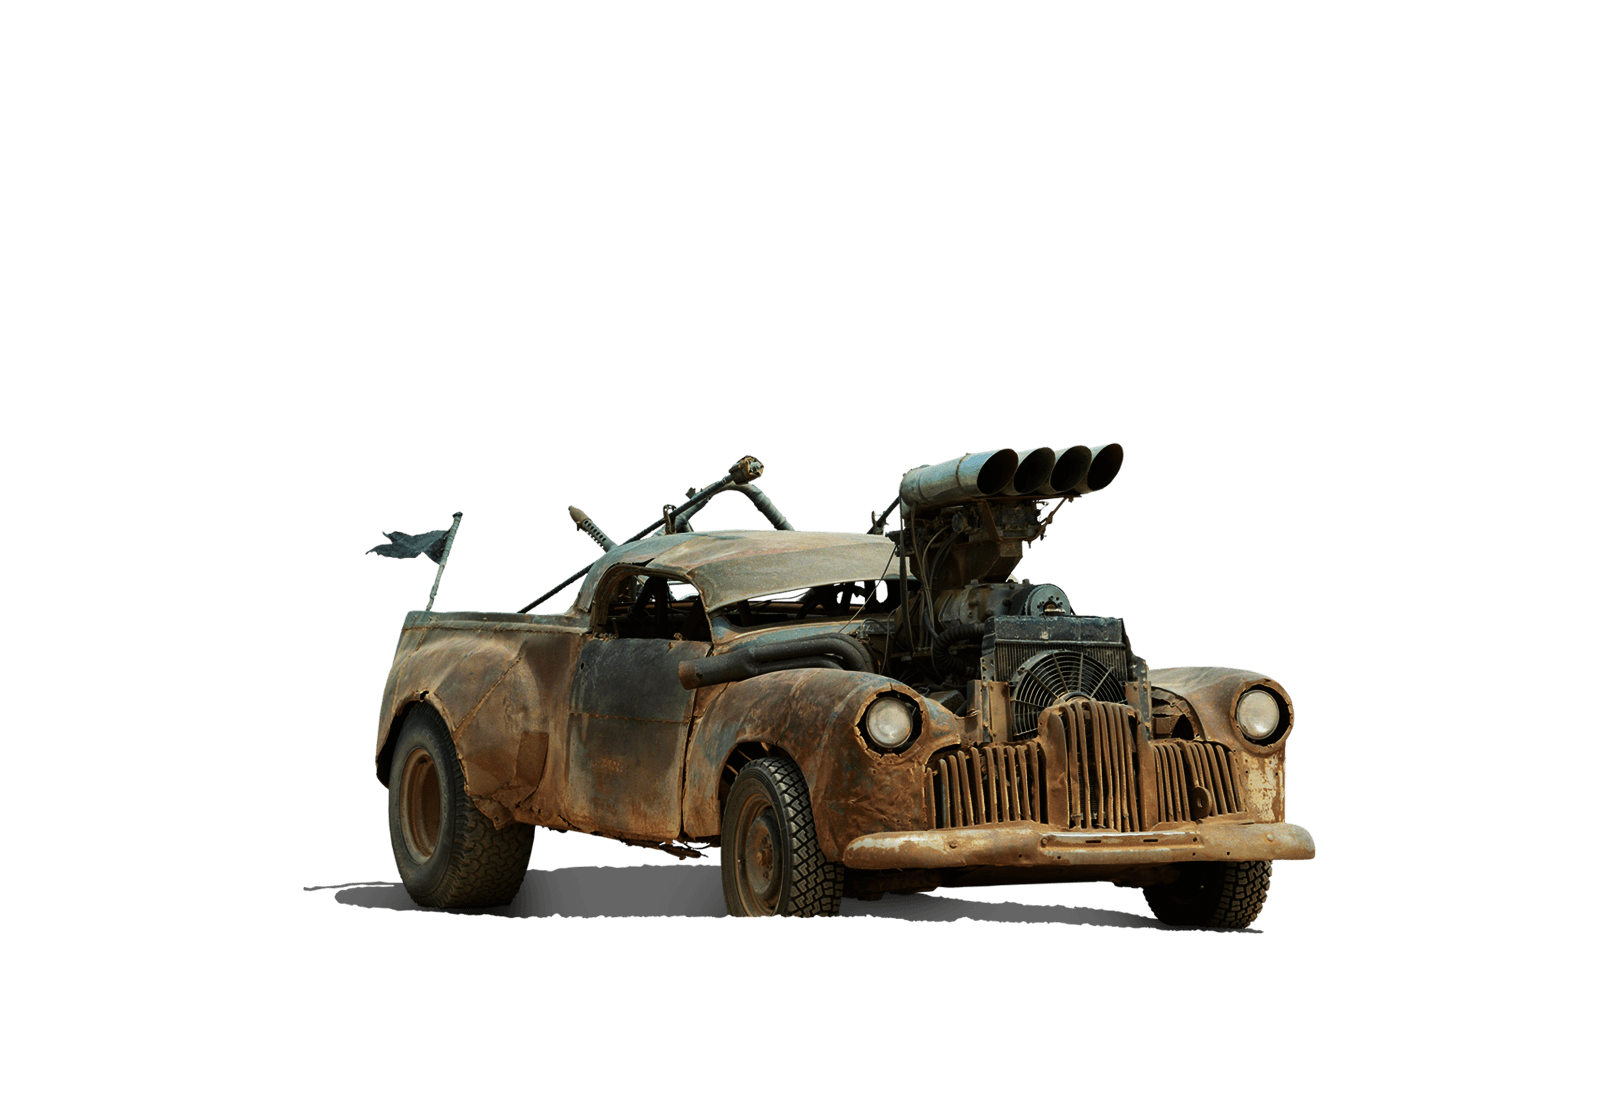 Mad Max Fury Road Vehicle Showcase Site Mad Max Mad Max Fury Road Fury Road